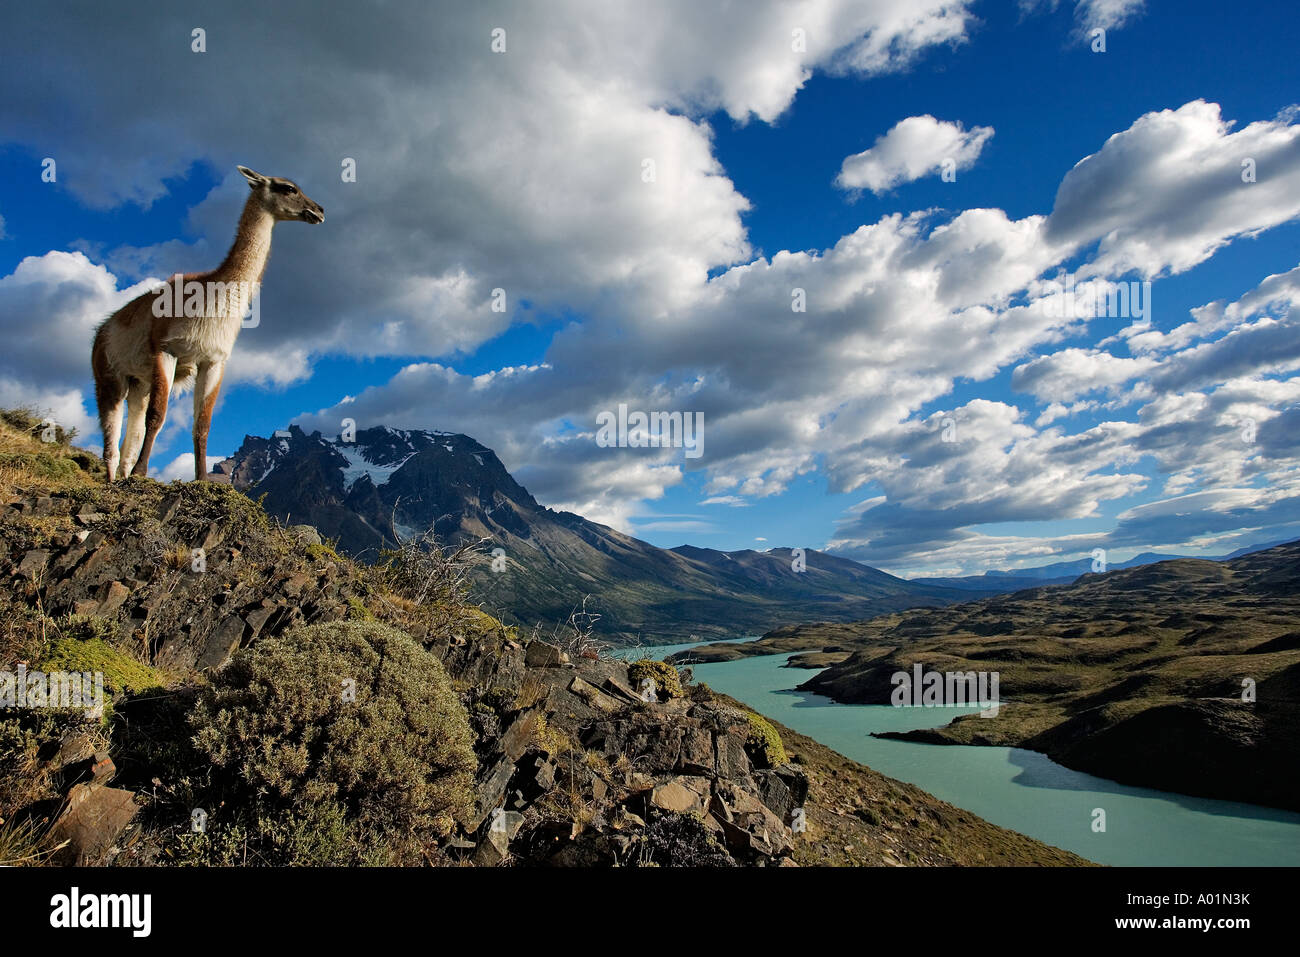 Guanaco Lama Guanicoe Guanako stehen am Hang der Nationalpark Torres del Paine-Chile-Südamerika Stockbild